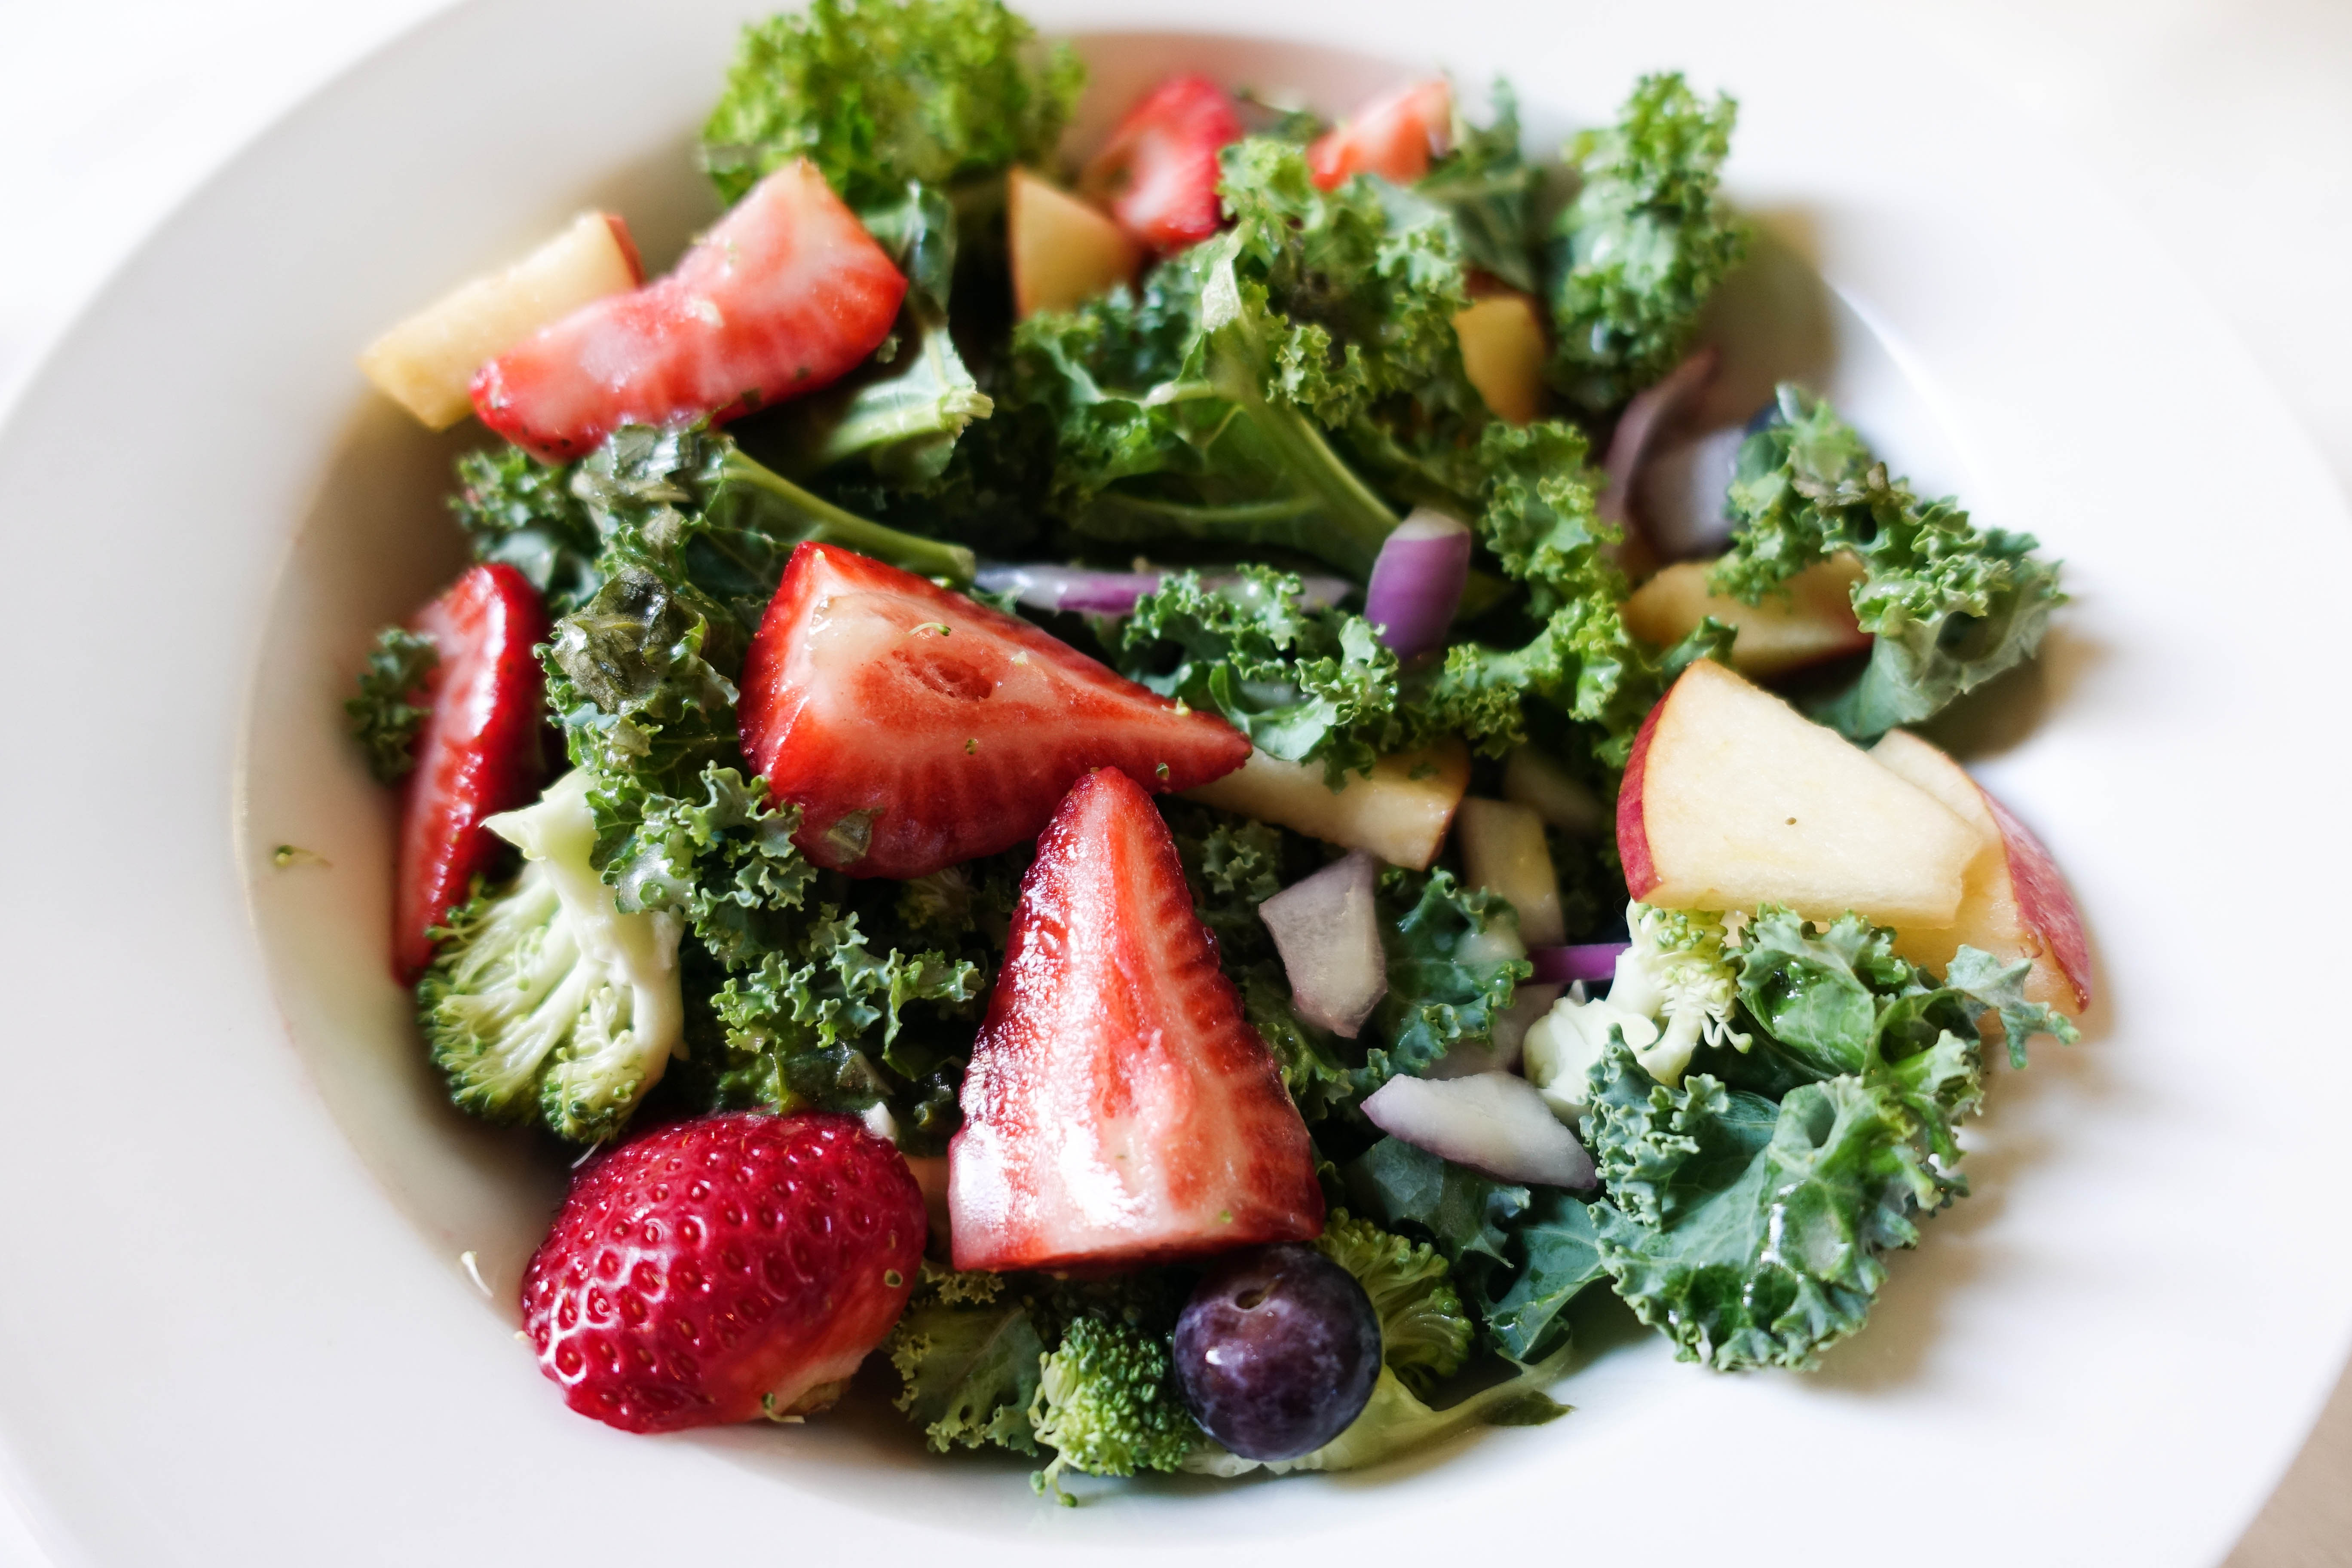 The Best Summer Detox Salad